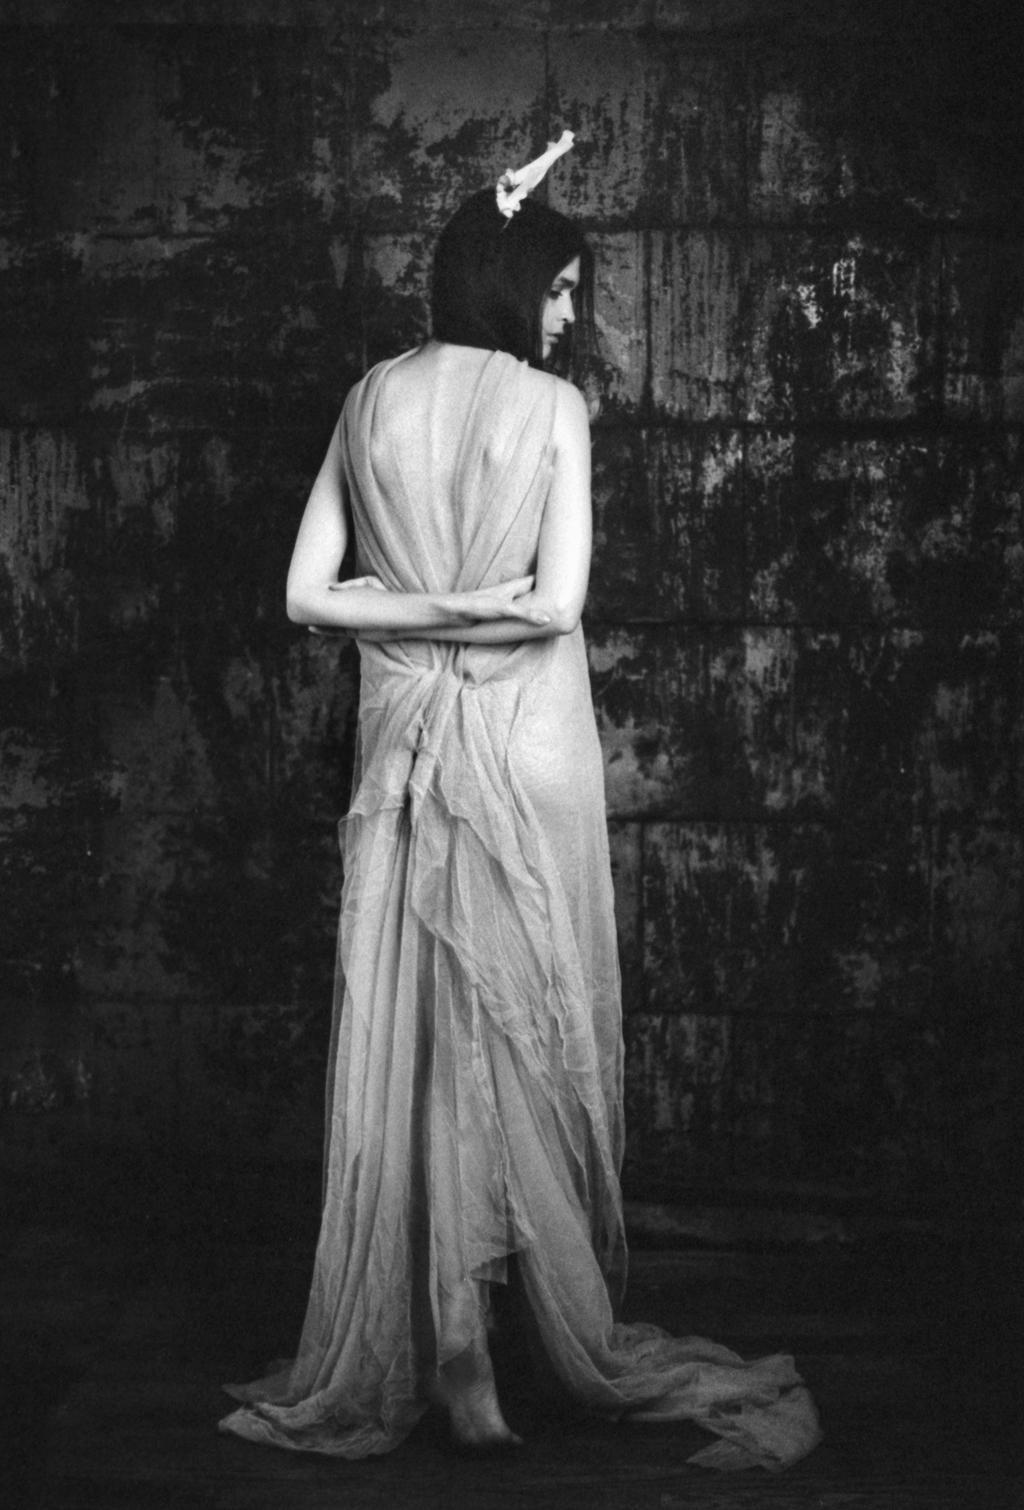 ... Emily Soto - Annabelle 11 by corvus-crux